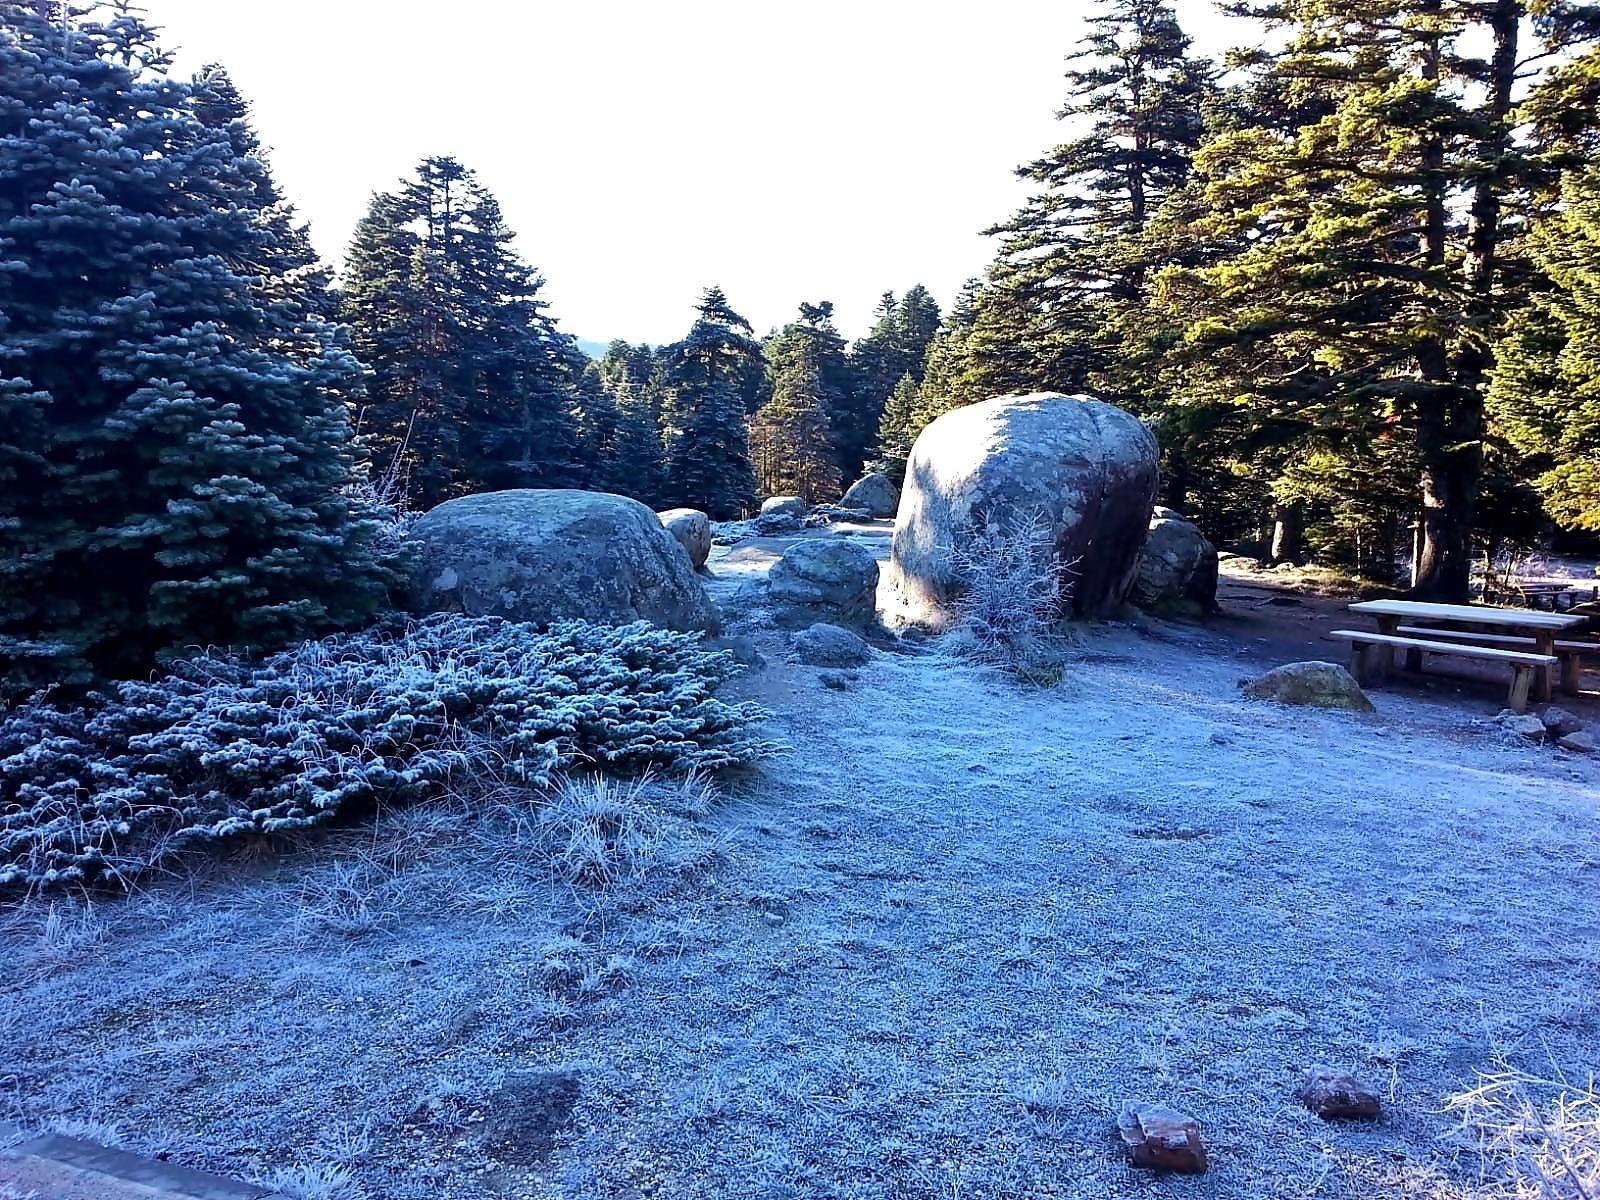 Light Snowfall, Pine Tree Forest, Rocks